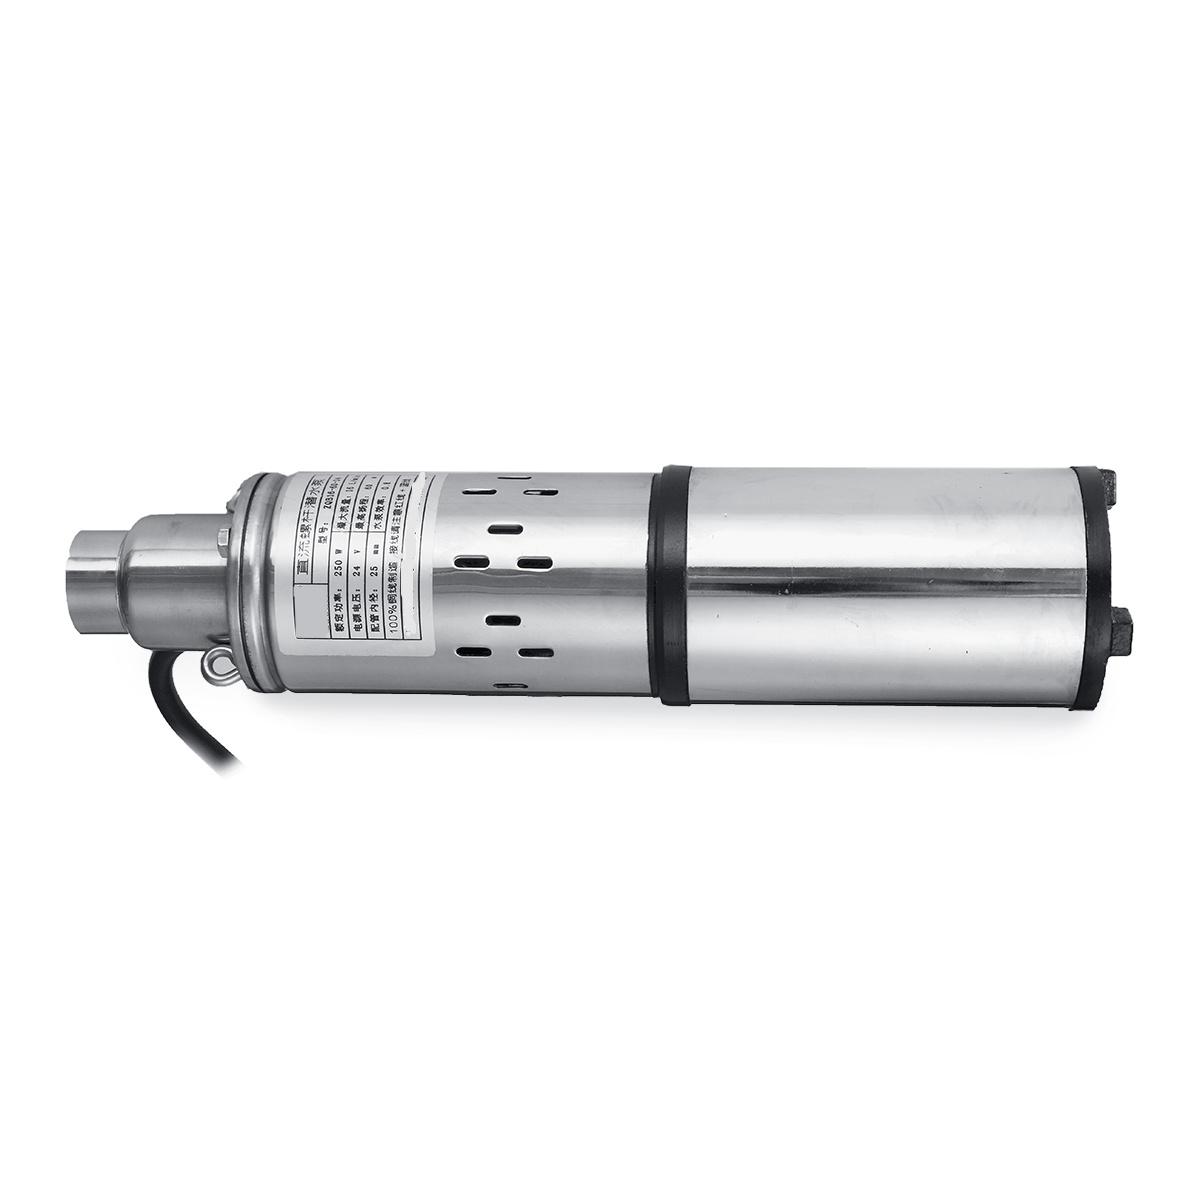 280W 24V Deep Well Pump Water Pump Submersible Pump 40M Lift